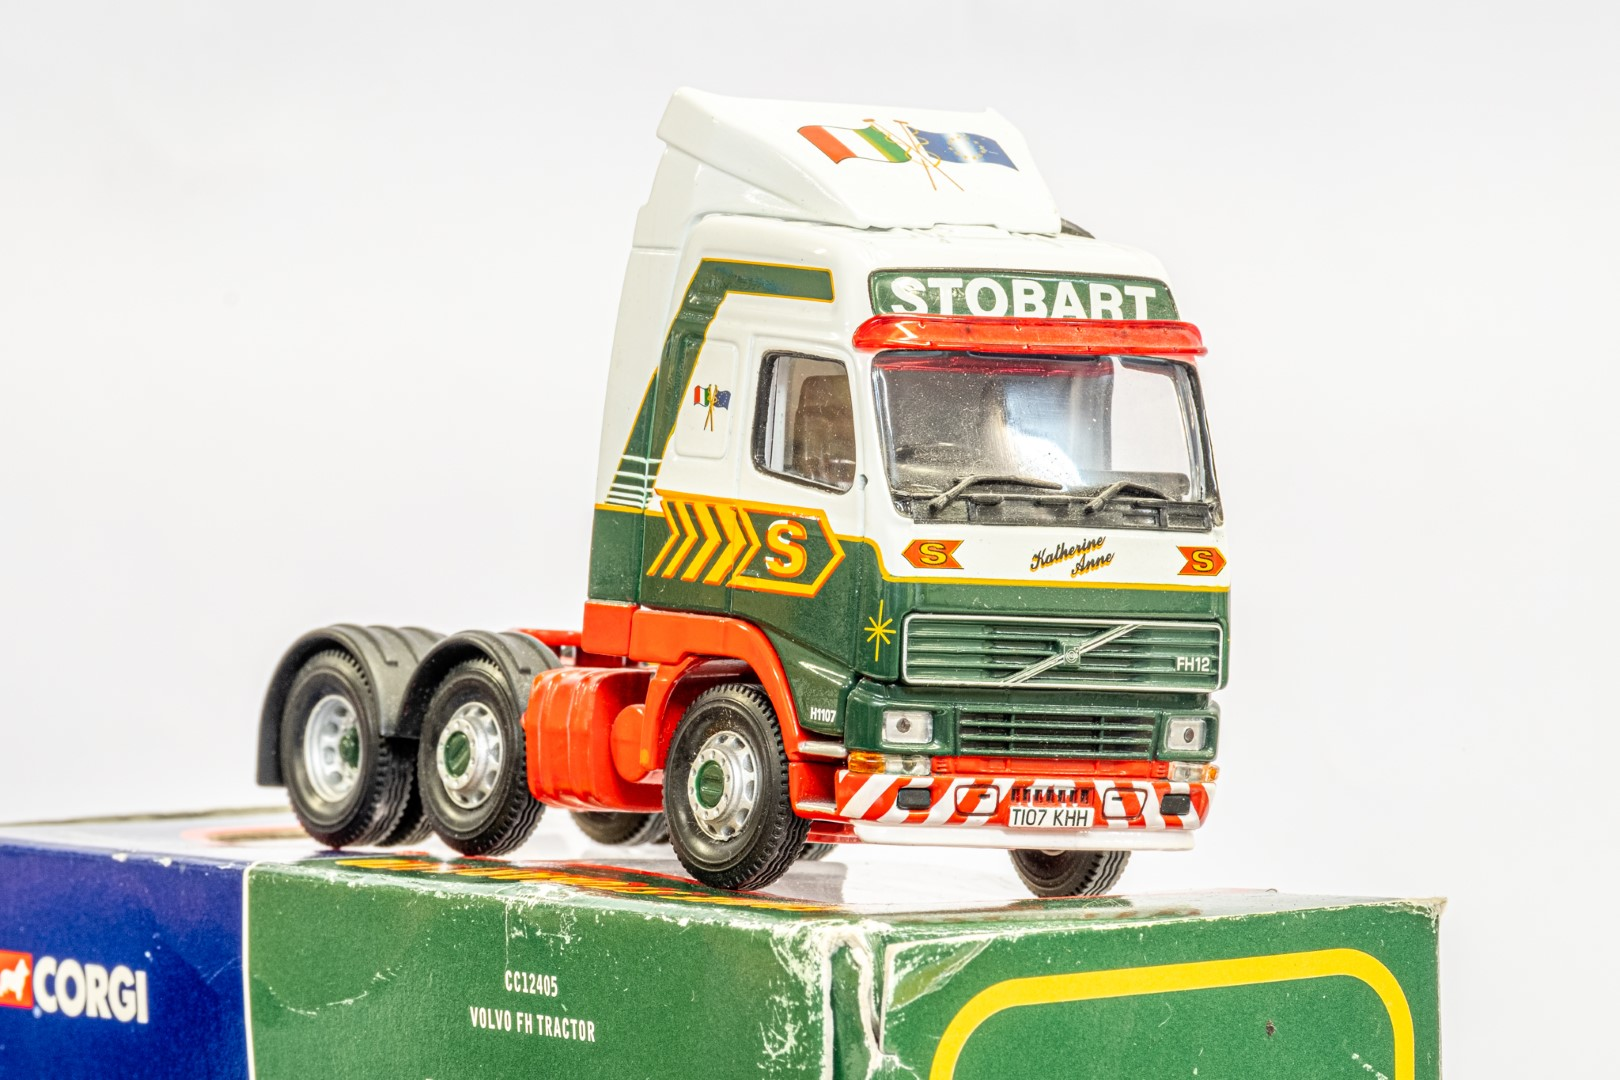 Corgi Volvo FH Tractot - Eddie Stobart Ltd - Image 7 of 7